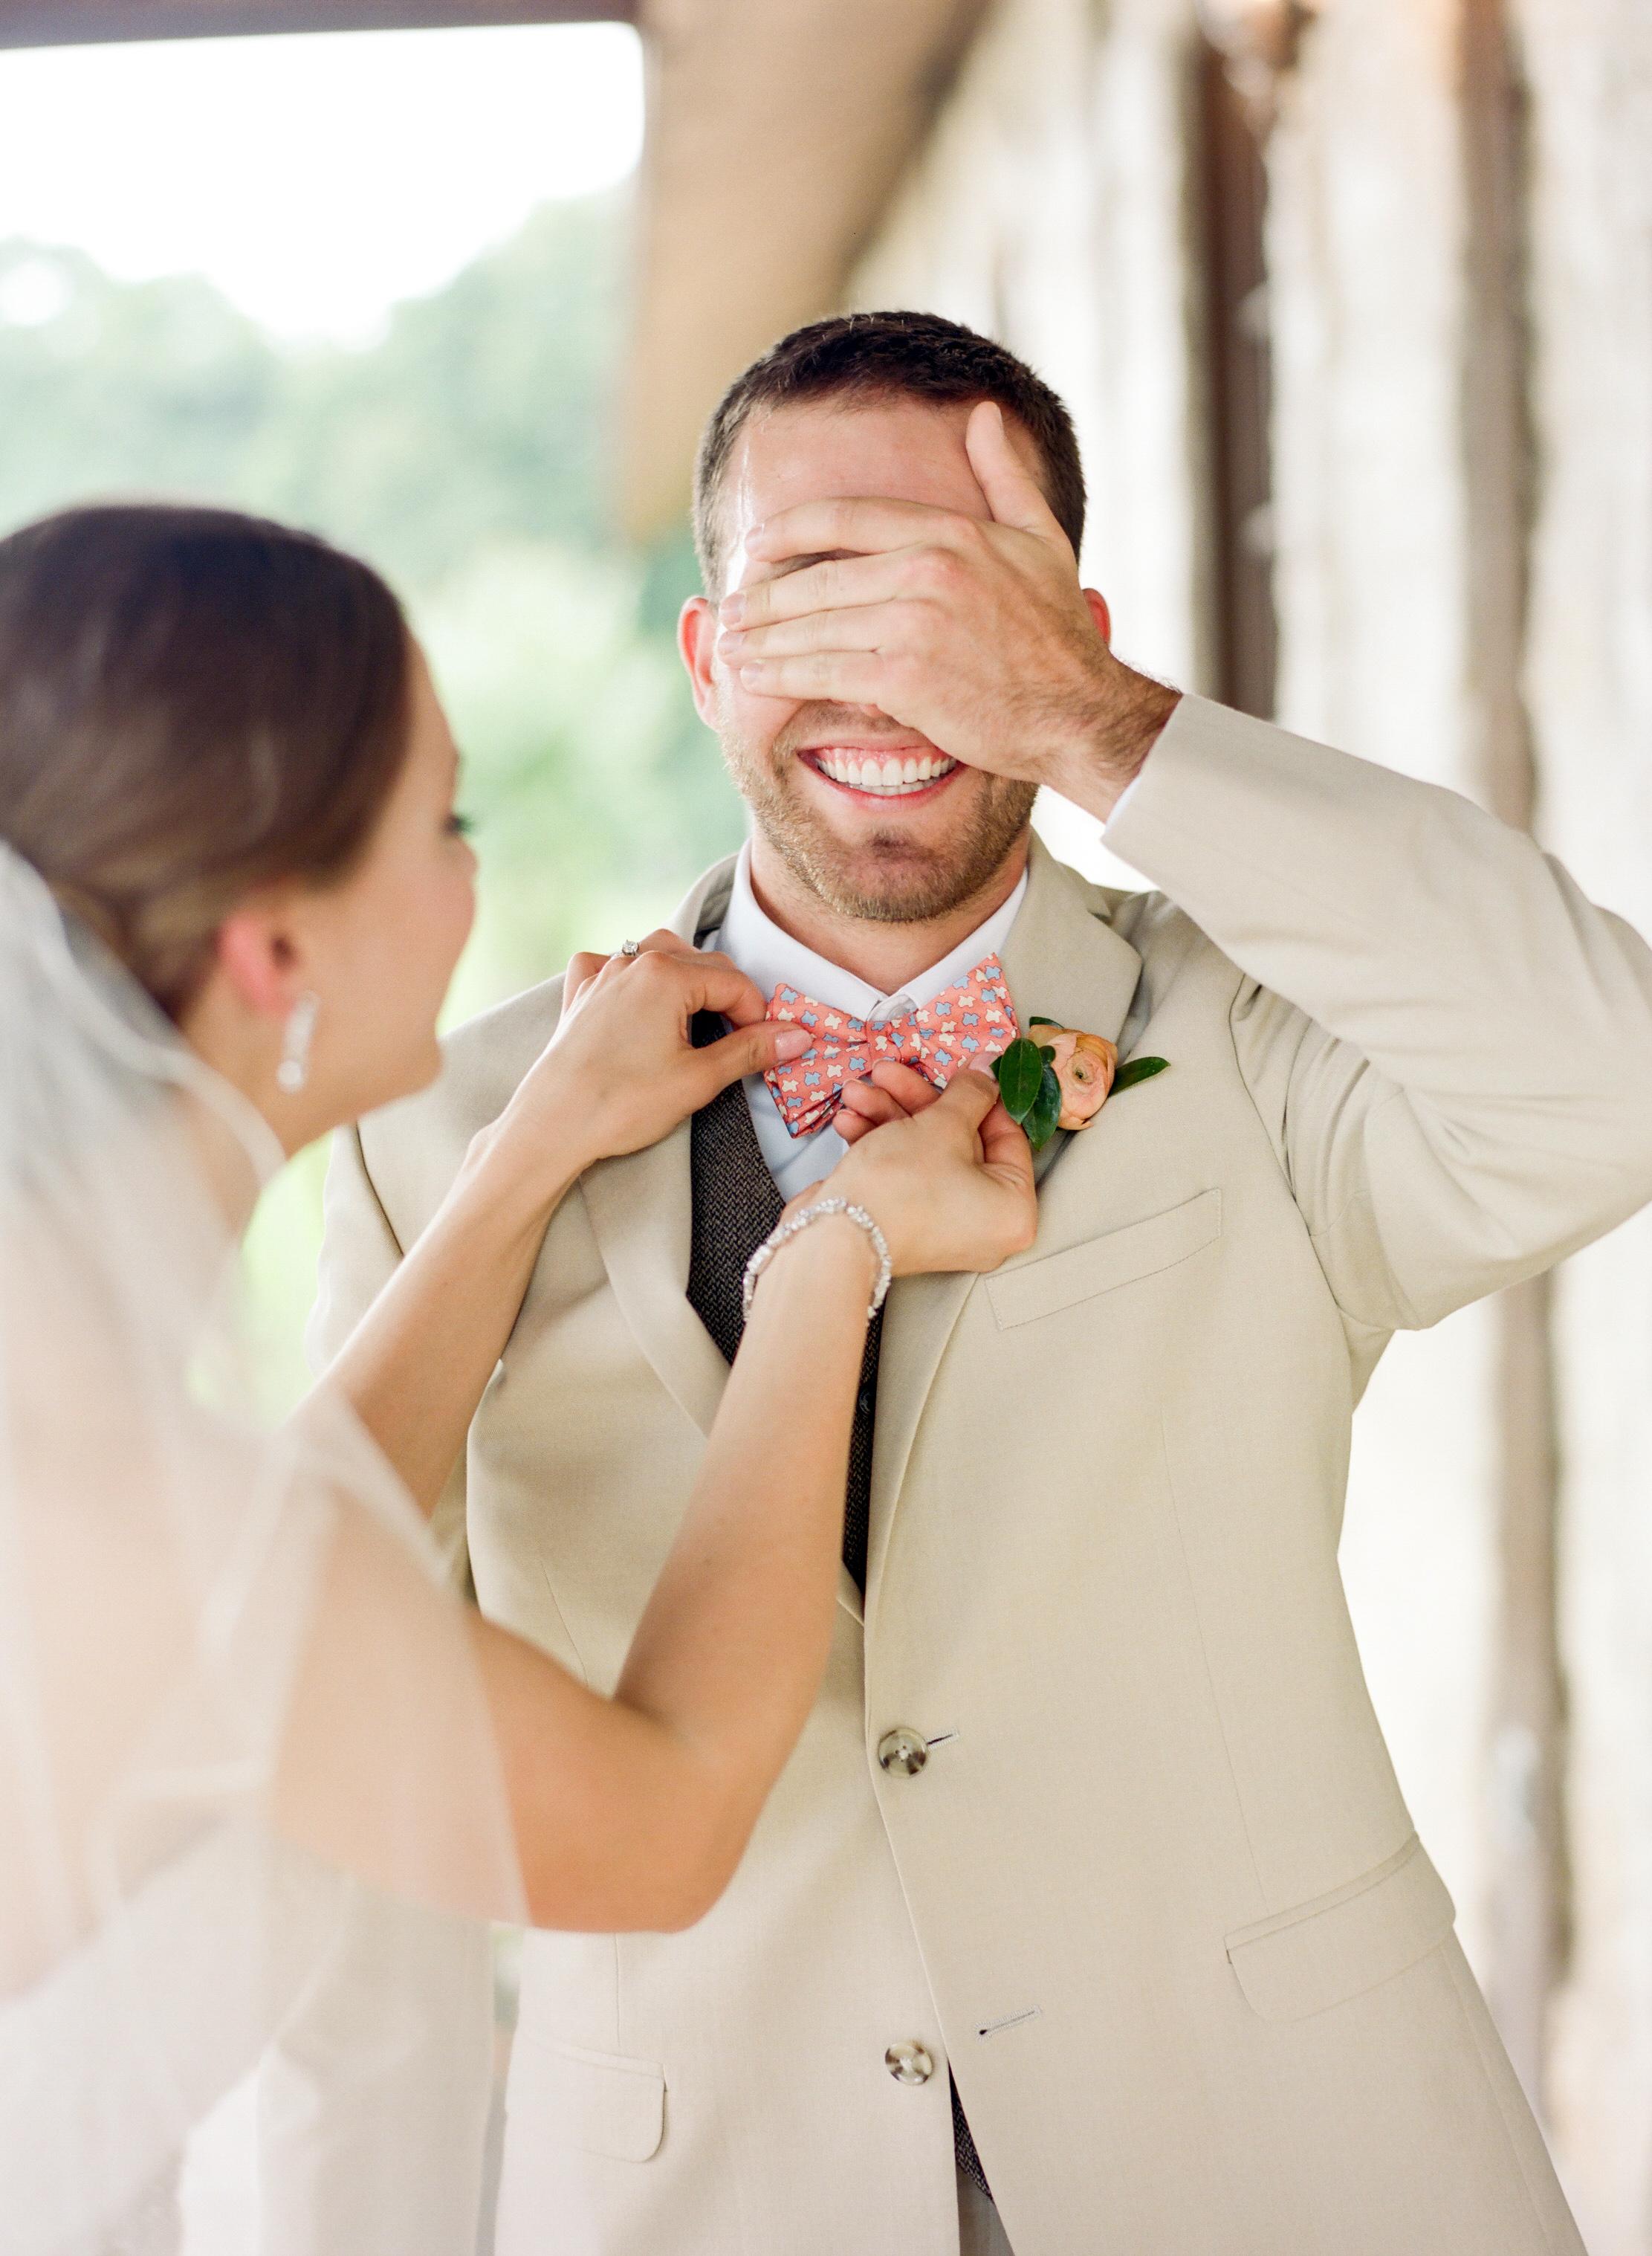 The-Knot-Wedding-Houston-Photographer-Fine-Art-Dana-Fernandez-Photography-Film-20.jpg